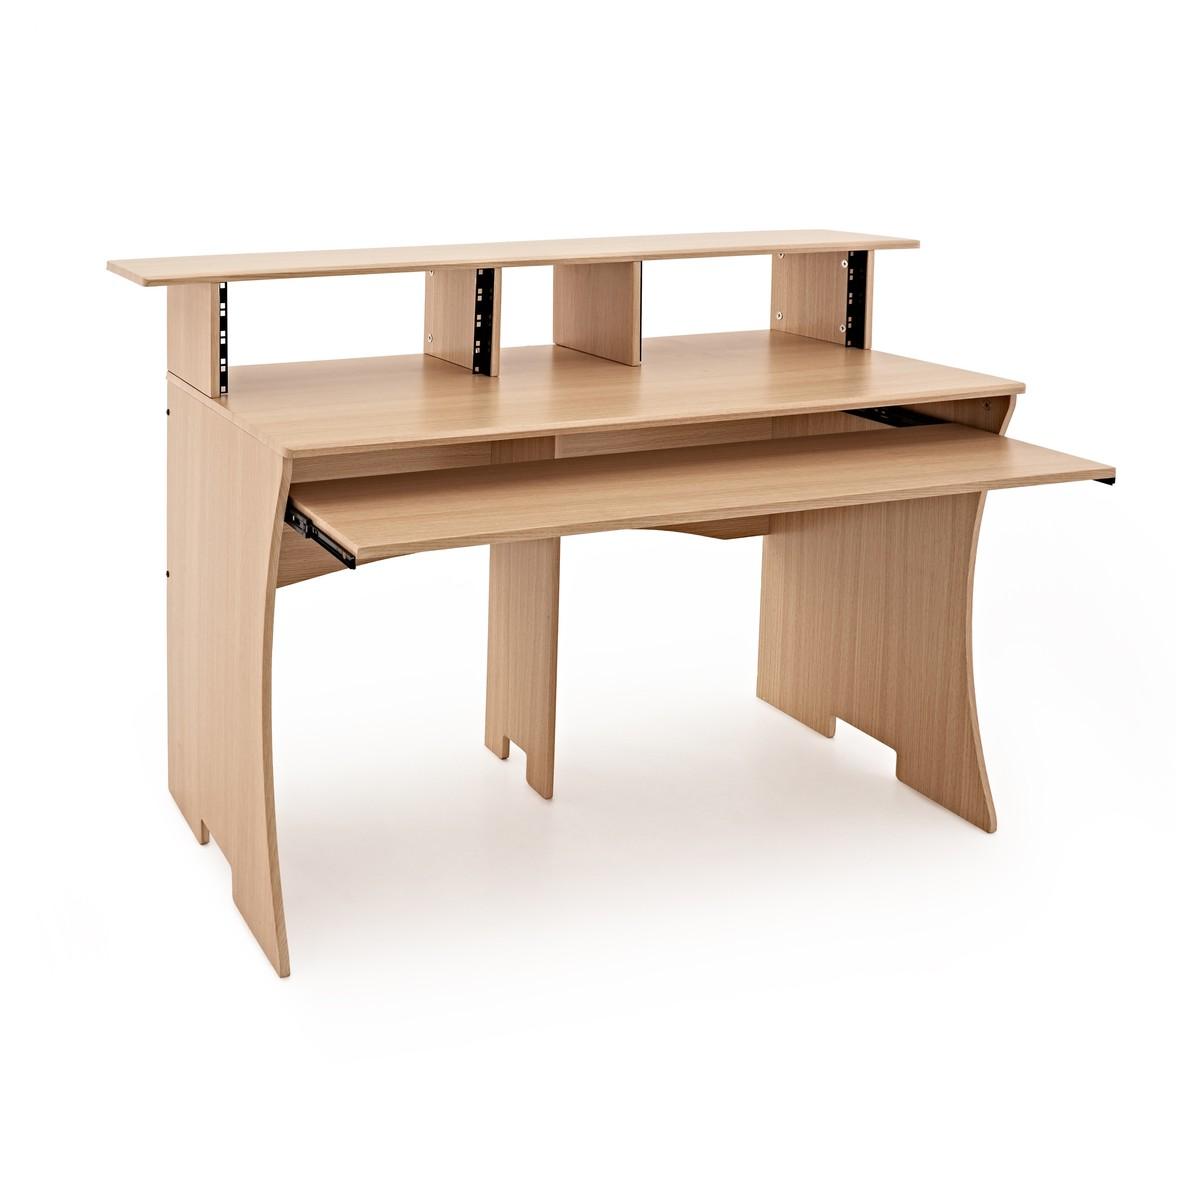 3 tier pro audio studio desk by gear4music 8u wood effect at gear4music. Black Bedroom Furniture Sets. Home Design Ideas